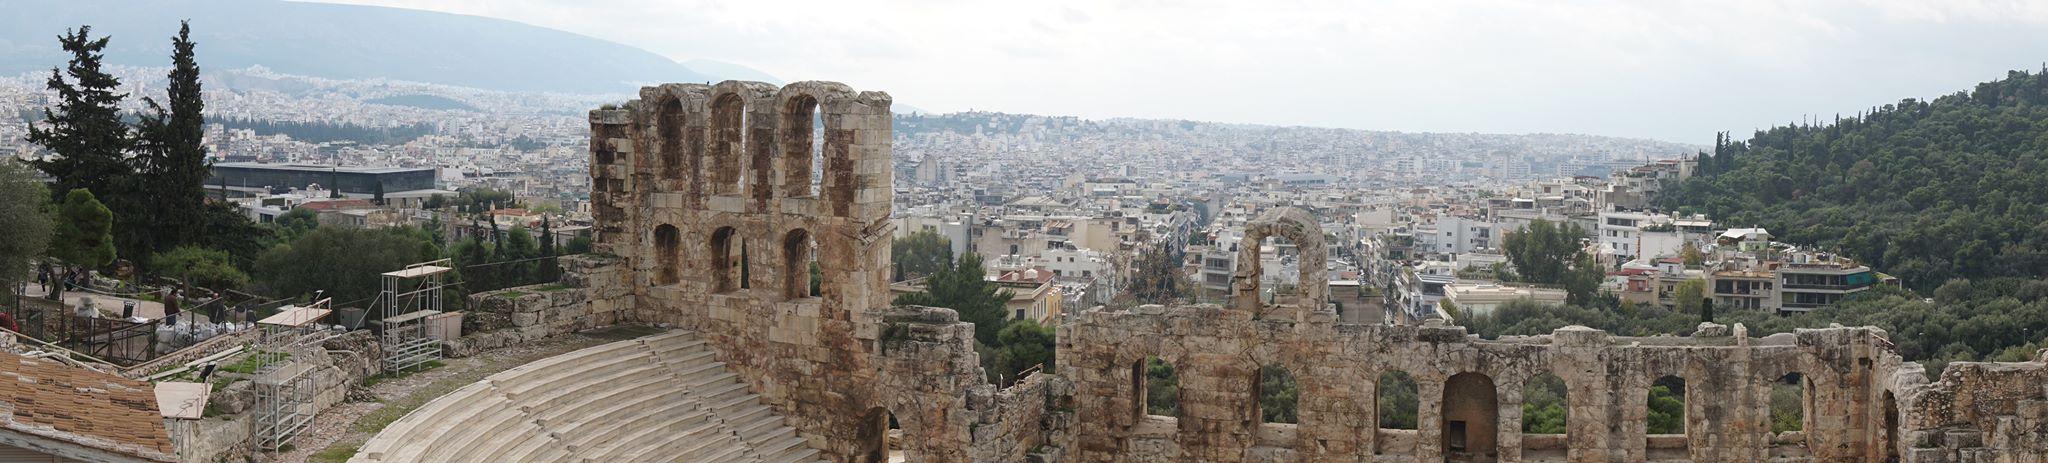 AthensP1